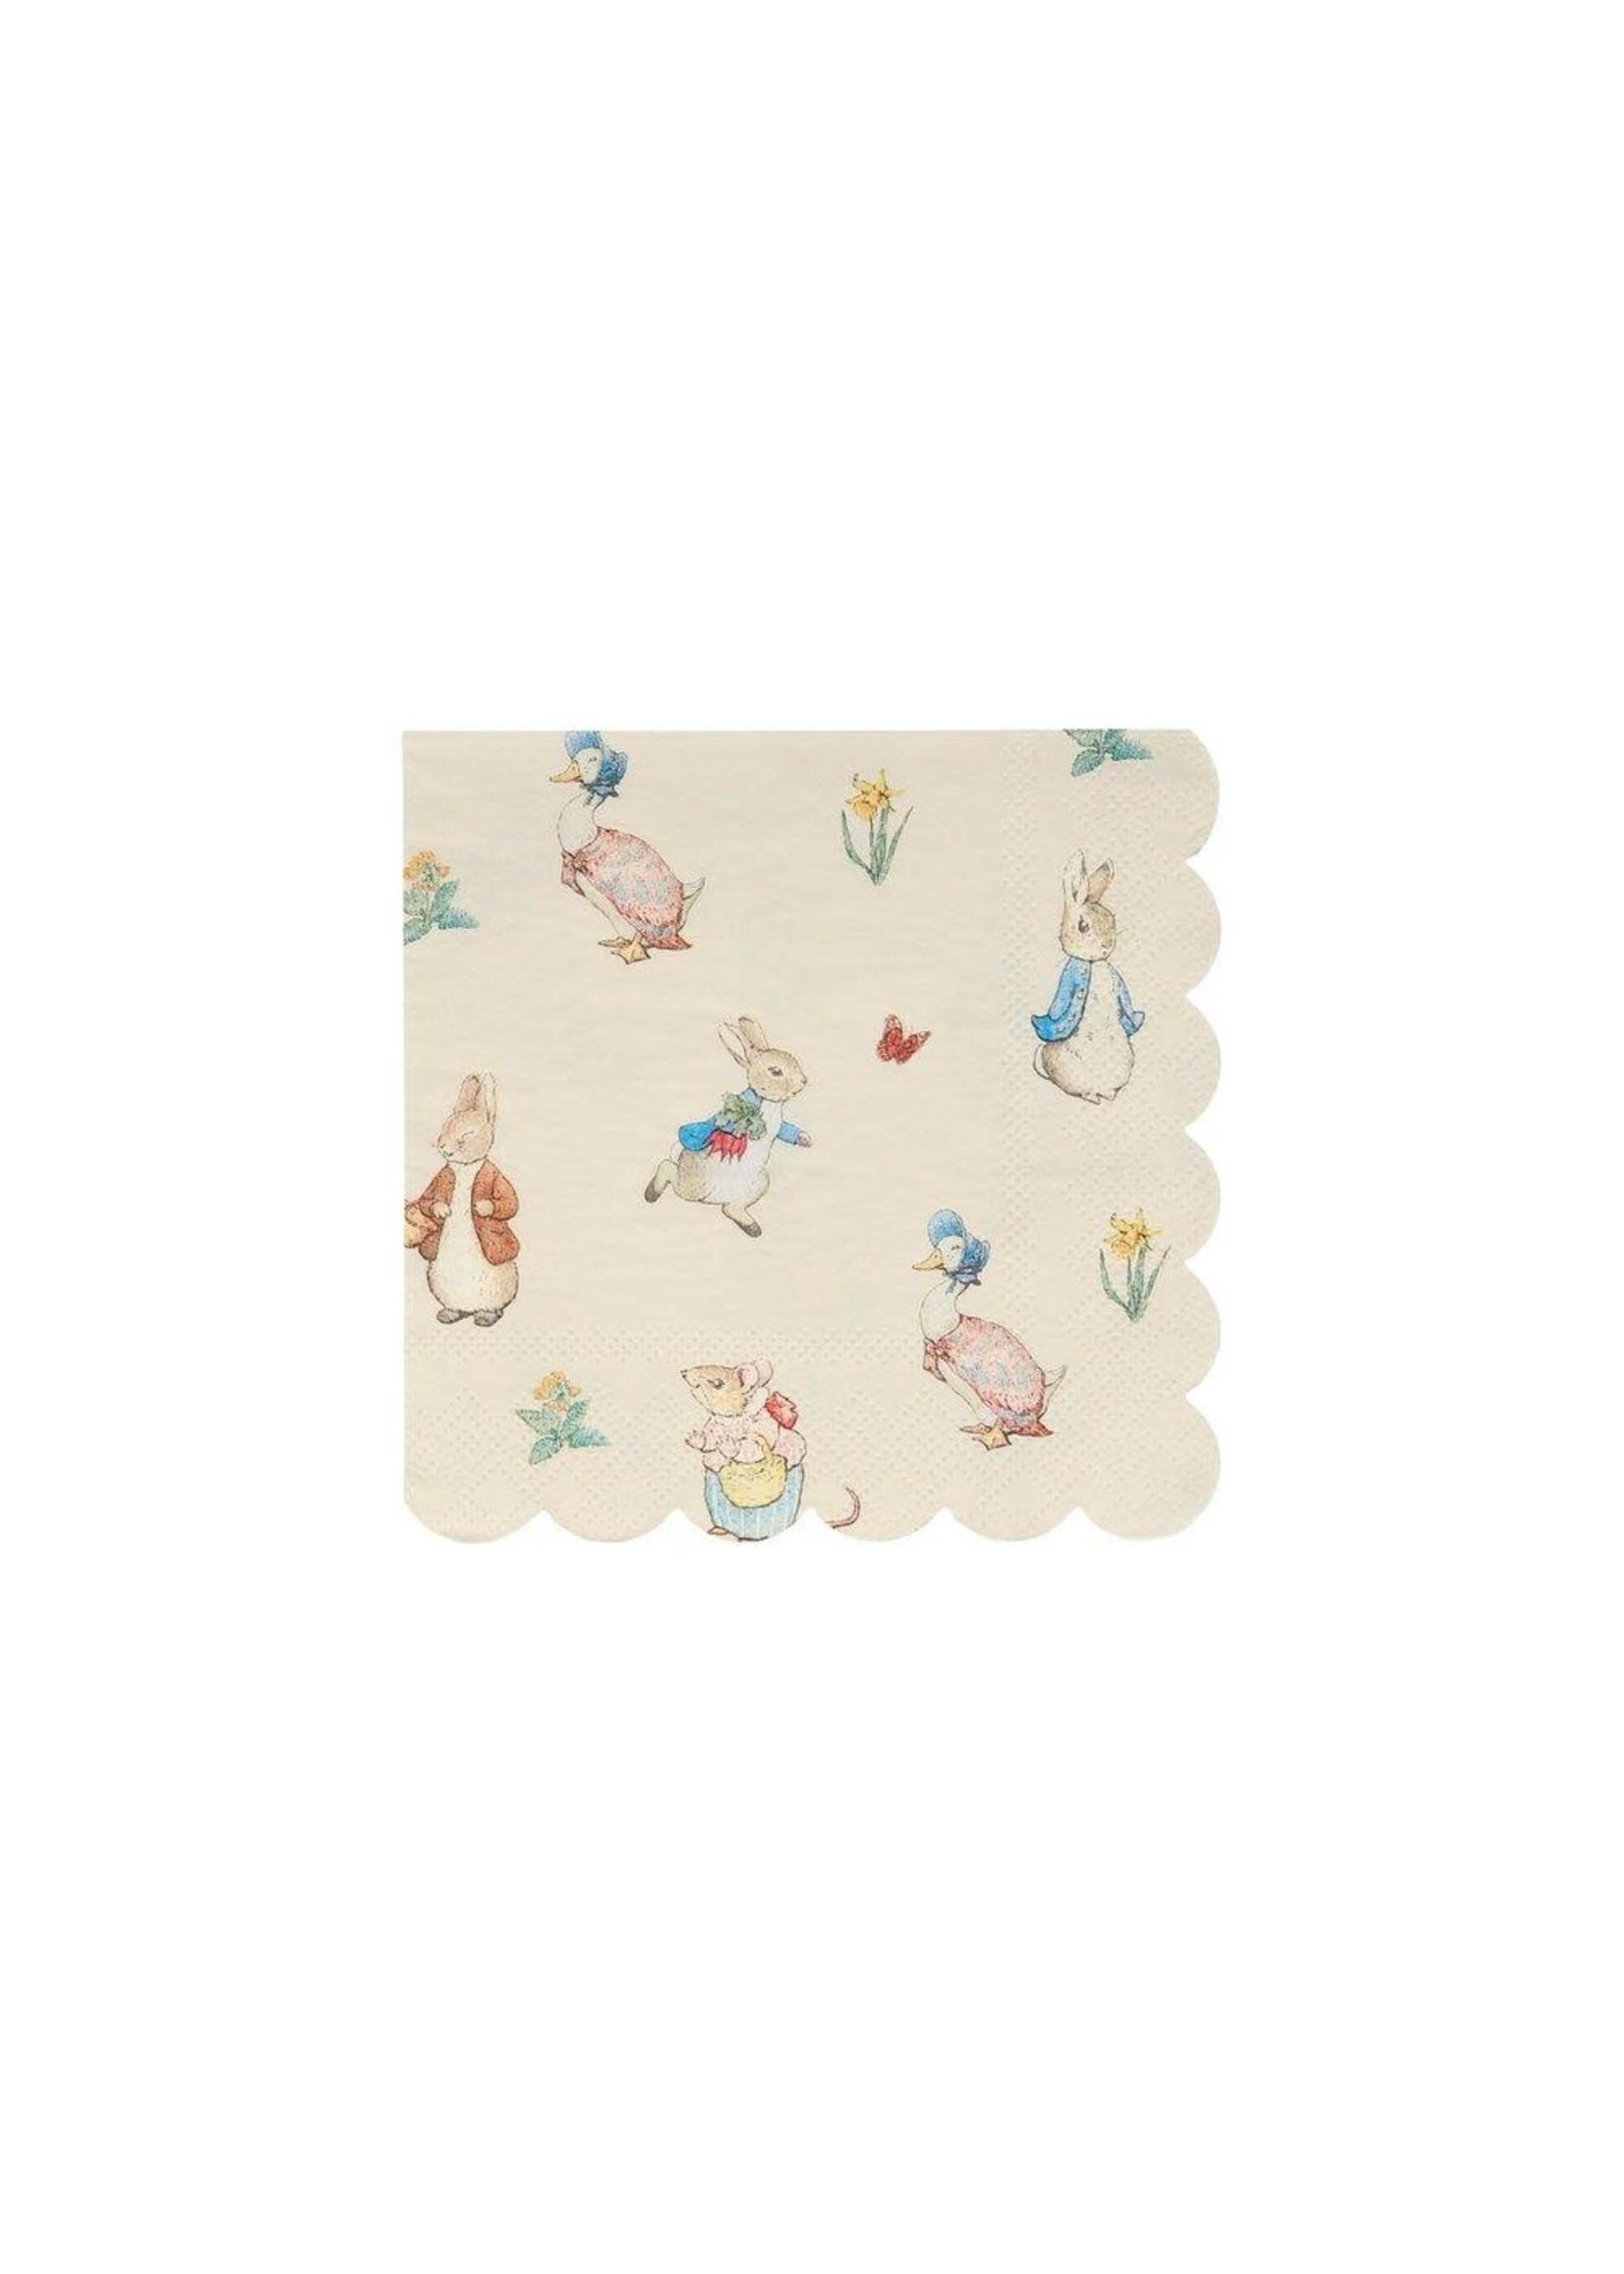 Meri Meri Paper Napkin - Peter Rabbit & Friends Small